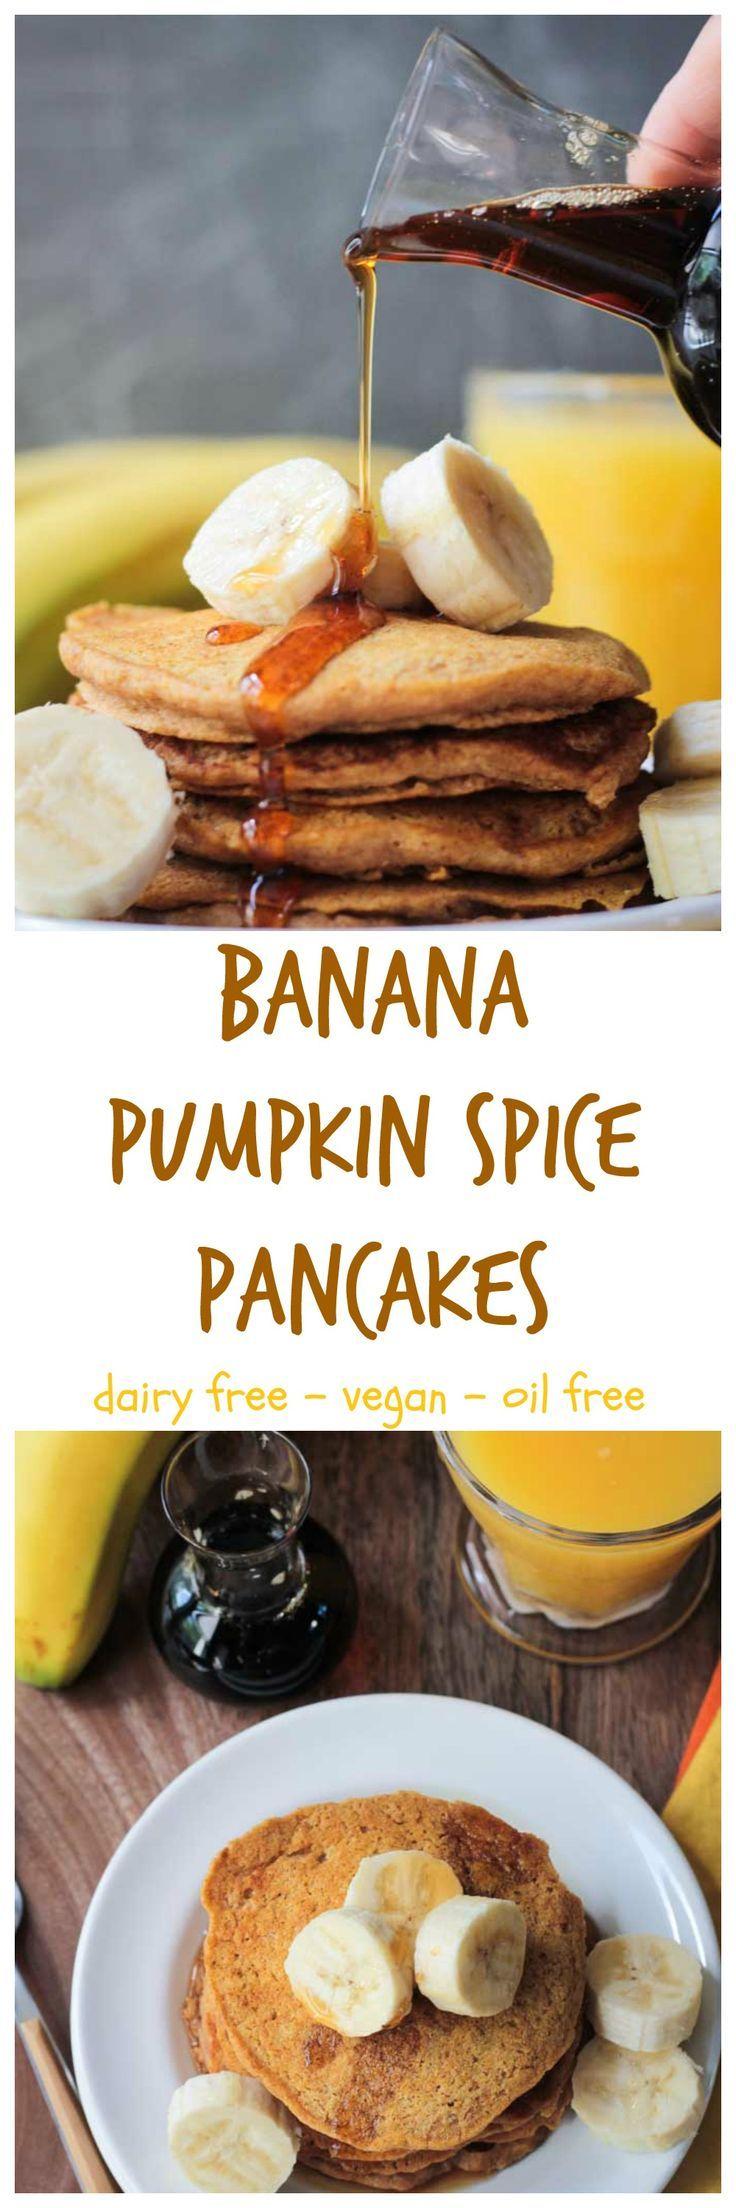 Banana Pumpkin Spice Pancakes - vegan   dairy free   oil free   egg free   whole wheat   autumn   fall   breakfast   brunch   pancake day   healthy   clean eating   cinnamon